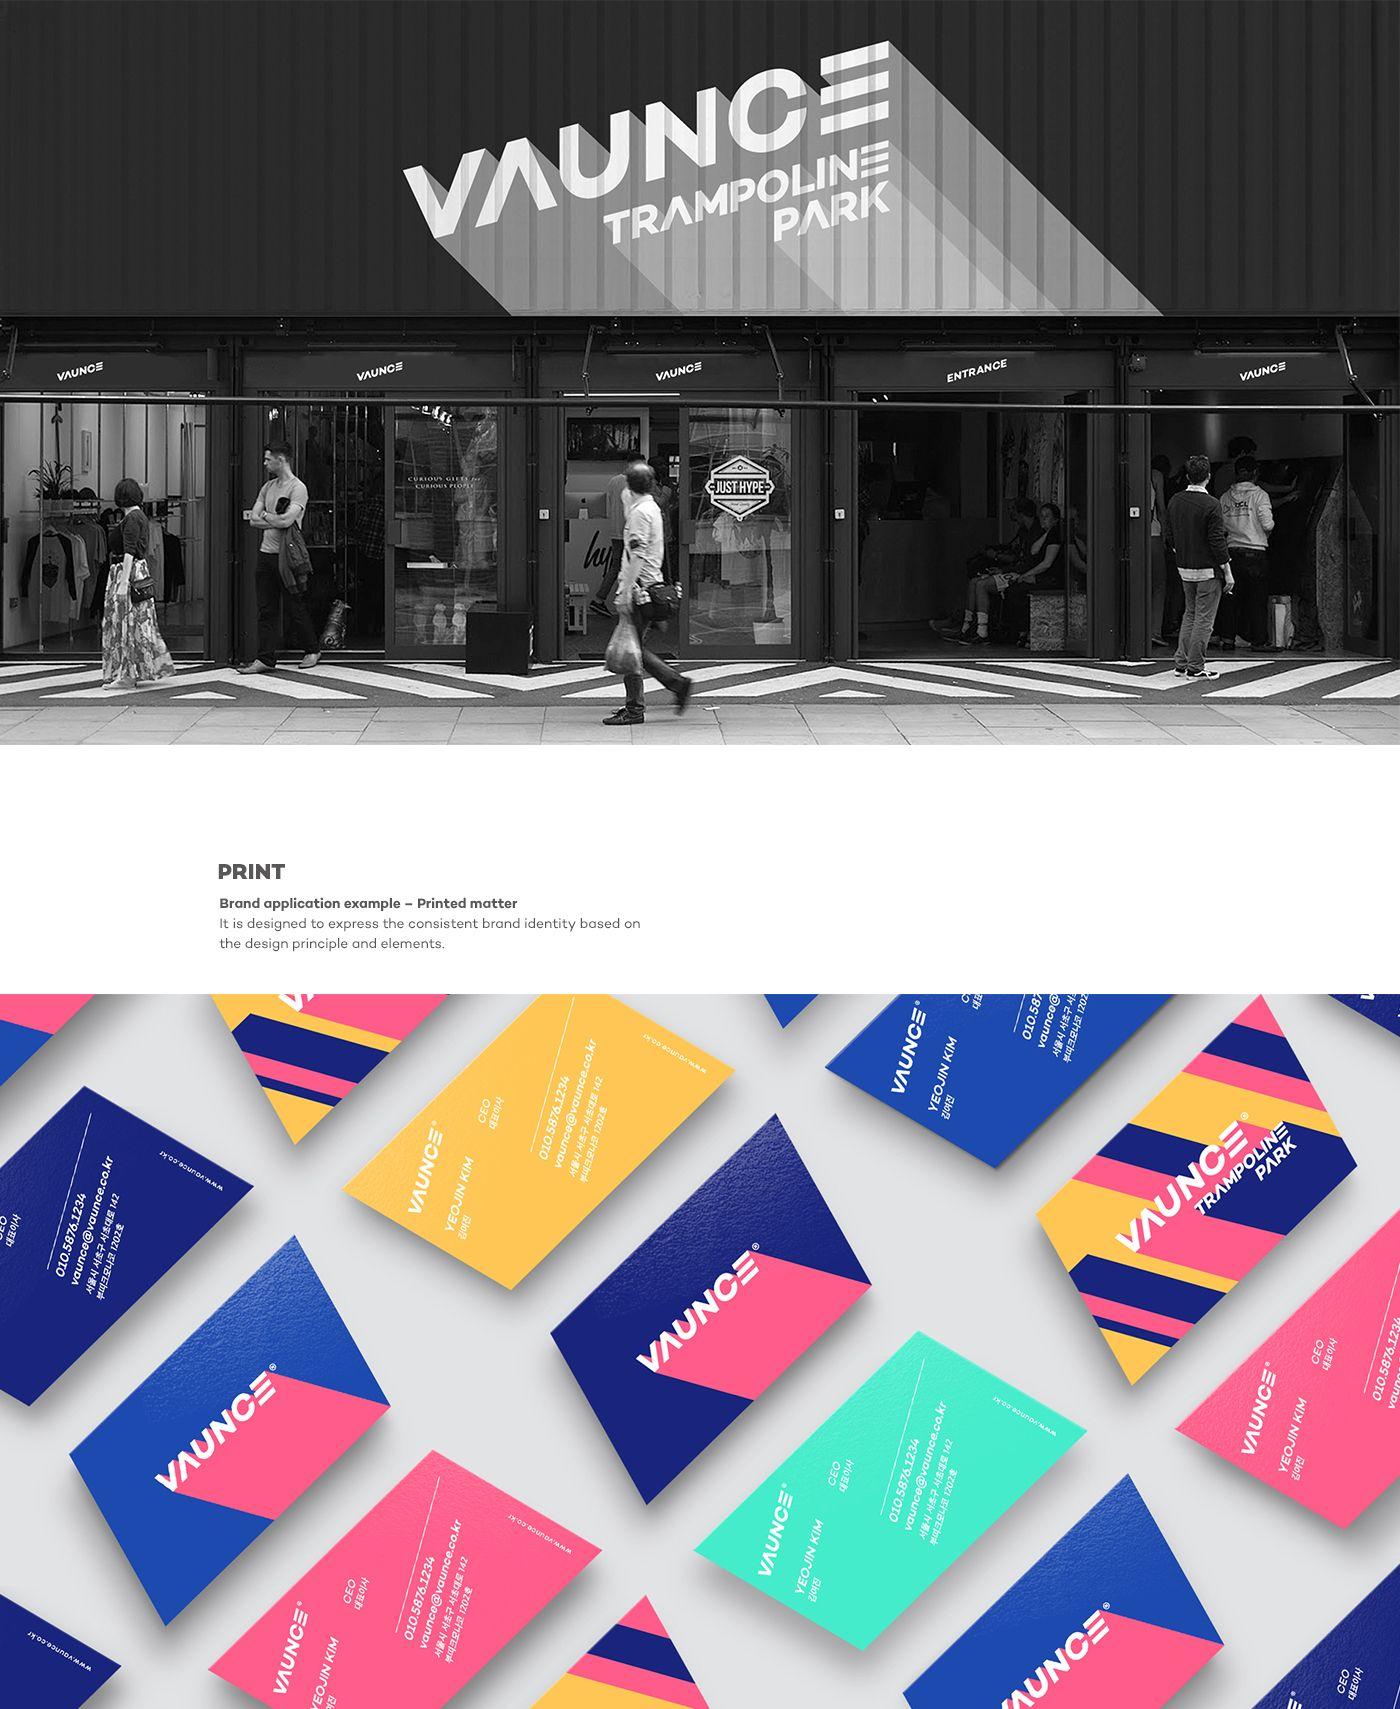 VAUNCE Trampoline Park Brand eXperience Design on Behance